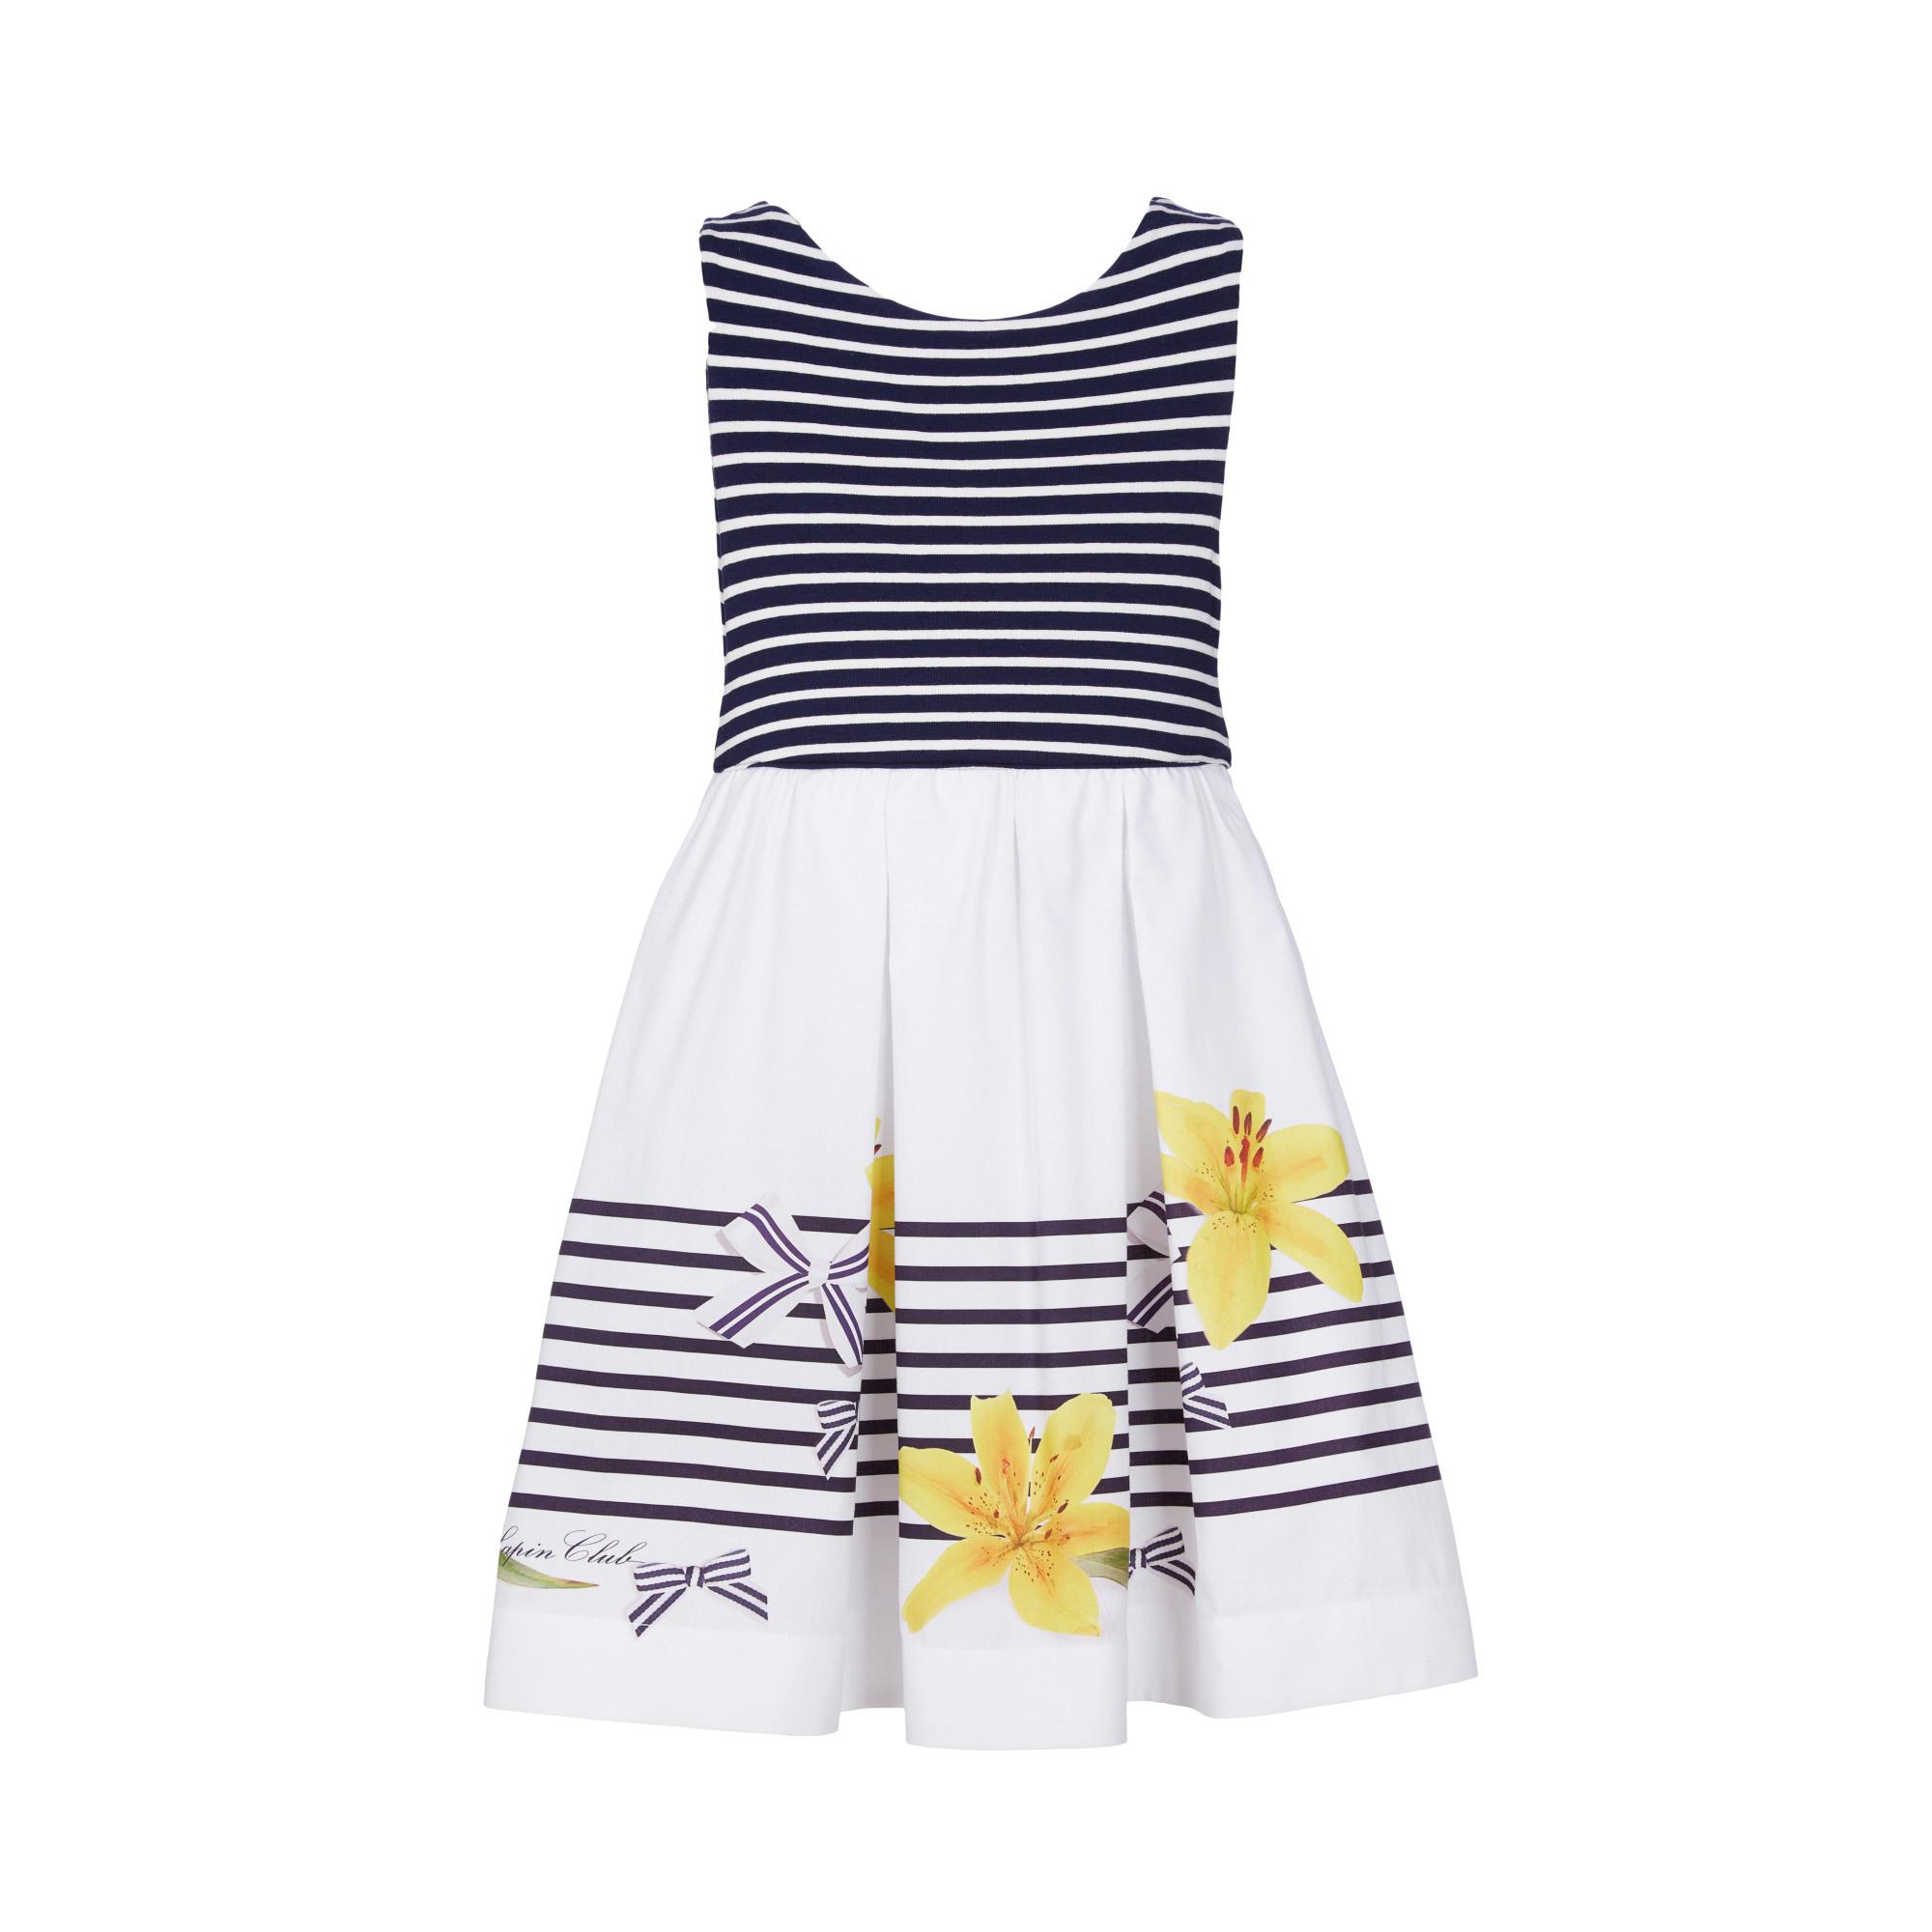 6fca61ee497 Φορέματα-Φούστες - Lapin House